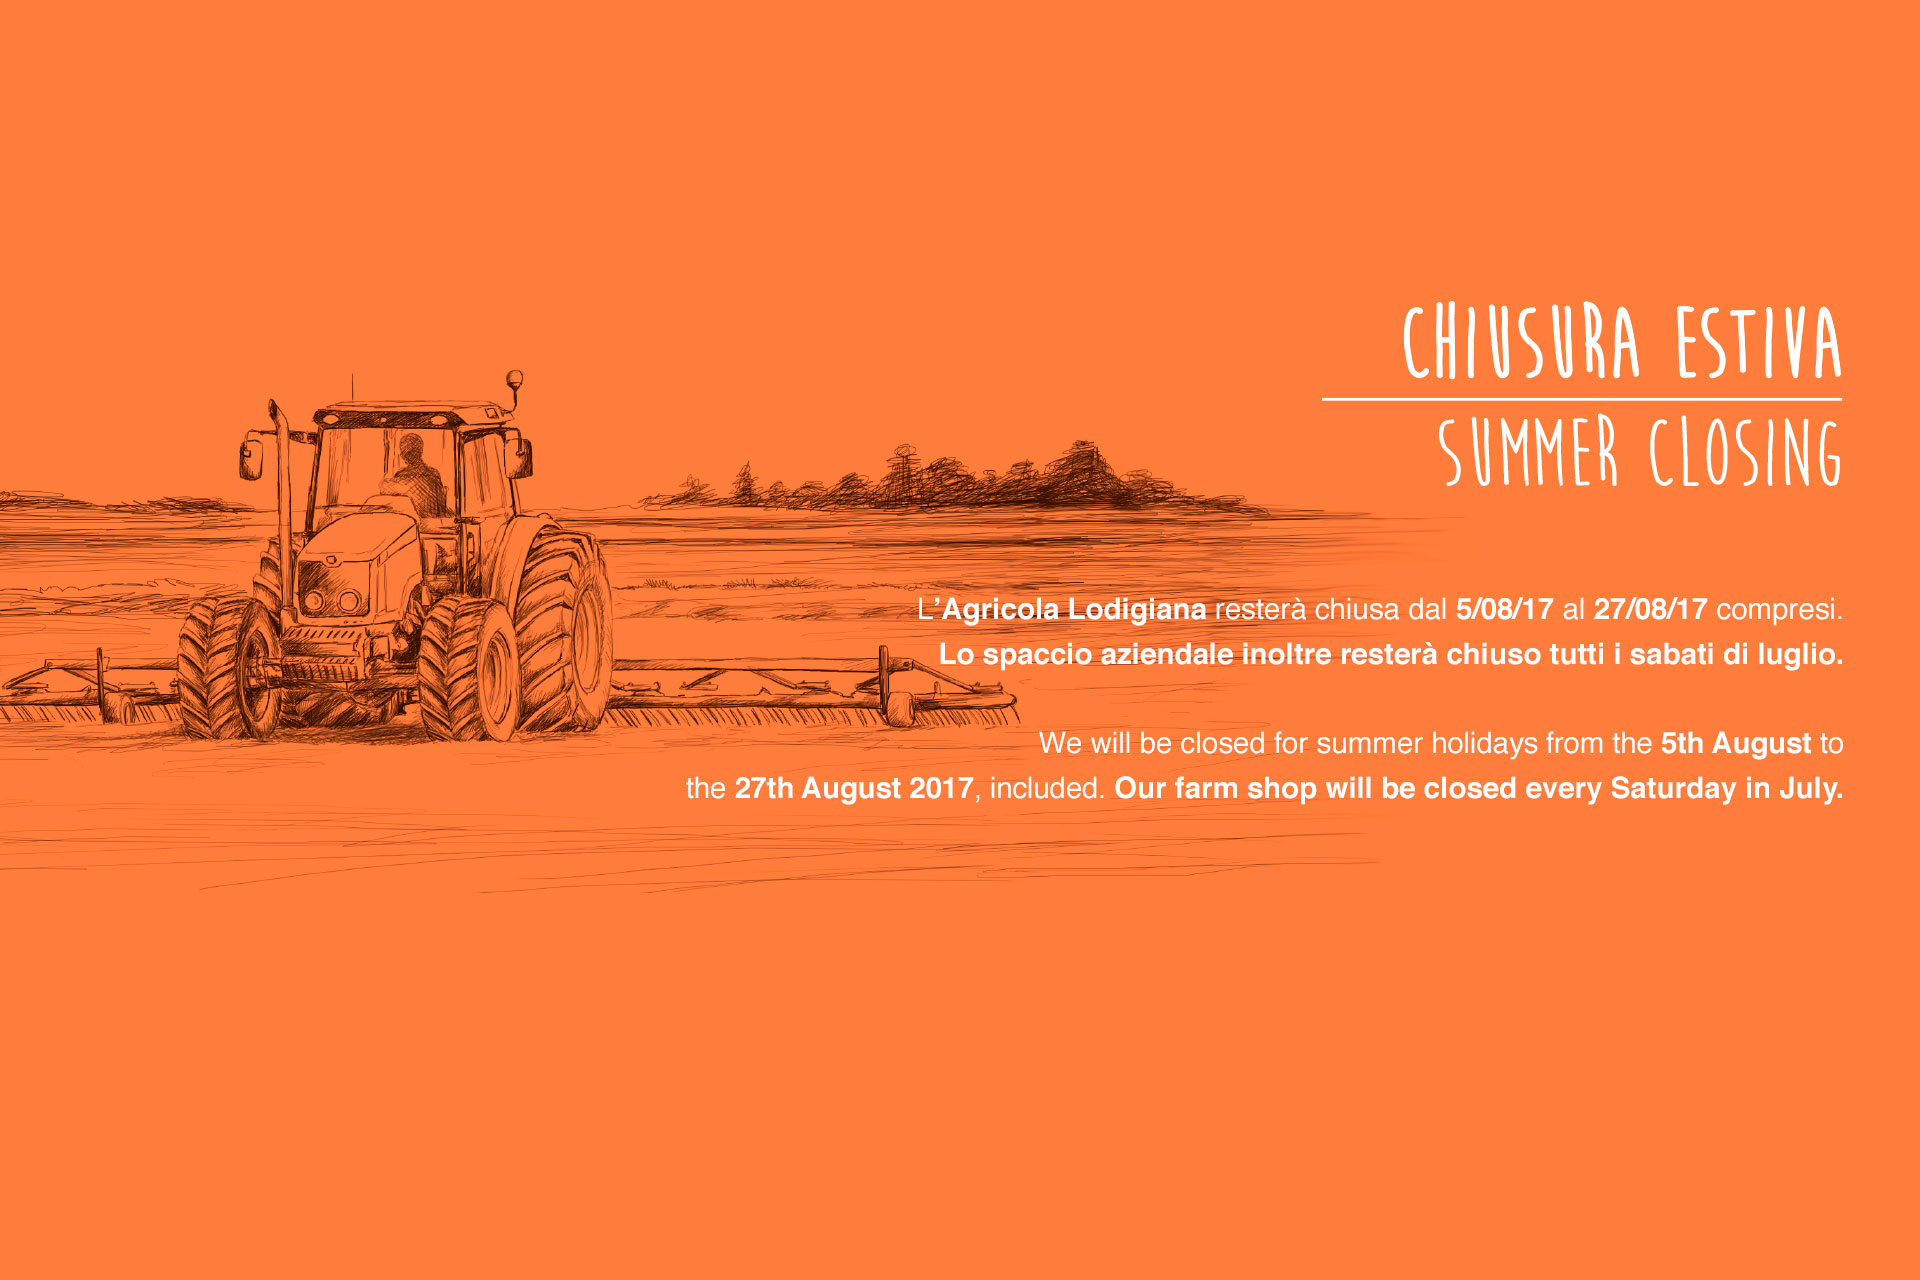 slide-chiusura-estiva-2017-3